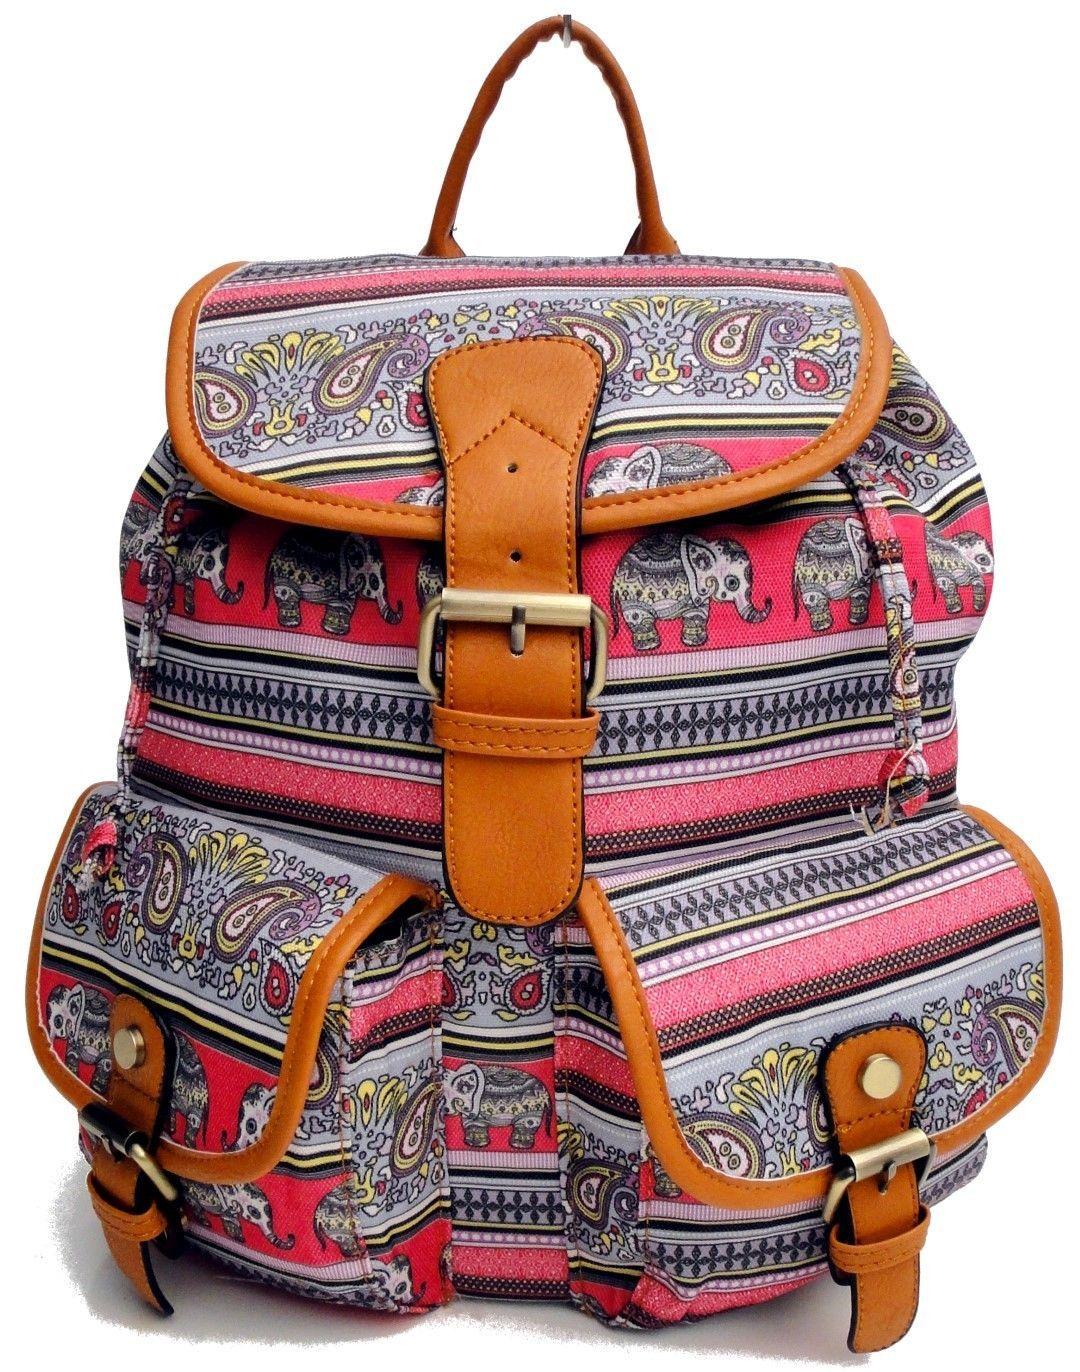 http://www.ebay.com/itm/BEAGLES-Elephant-Backpack-Rucksack-School ...